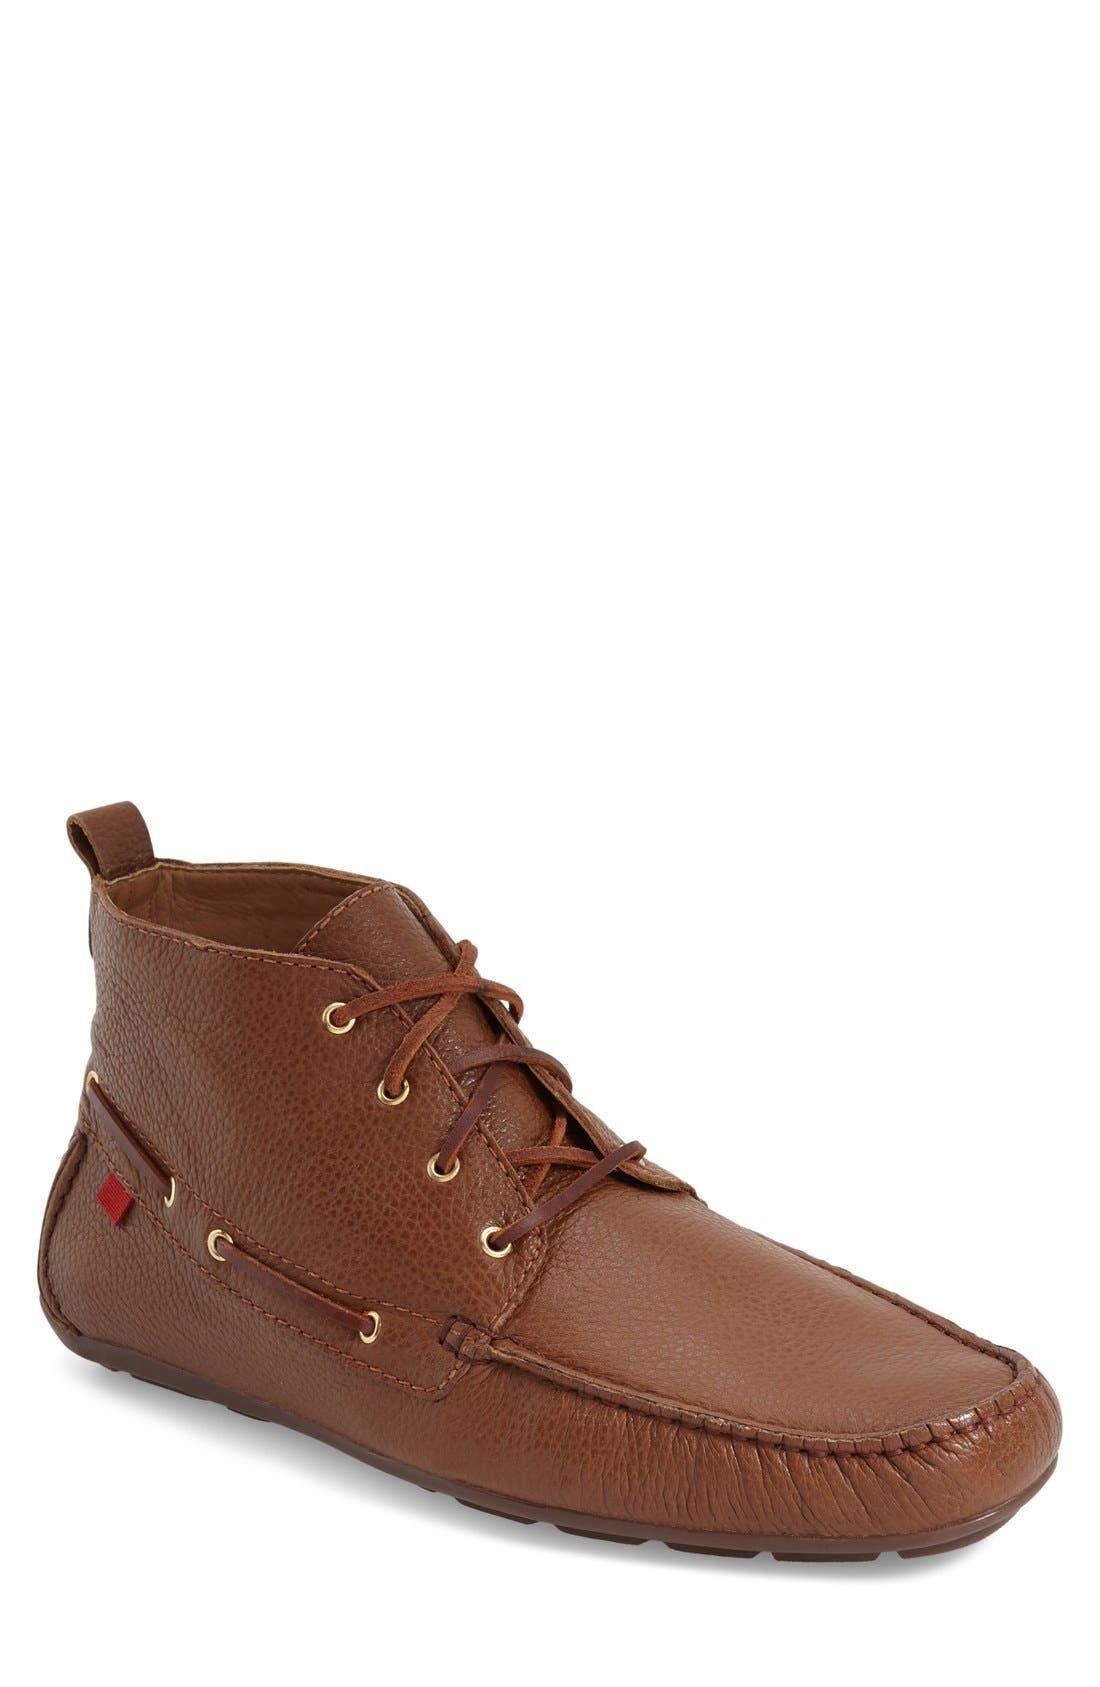 'Soho' Boot,                             Main thumbnail 1, color,                             Cognac Leather